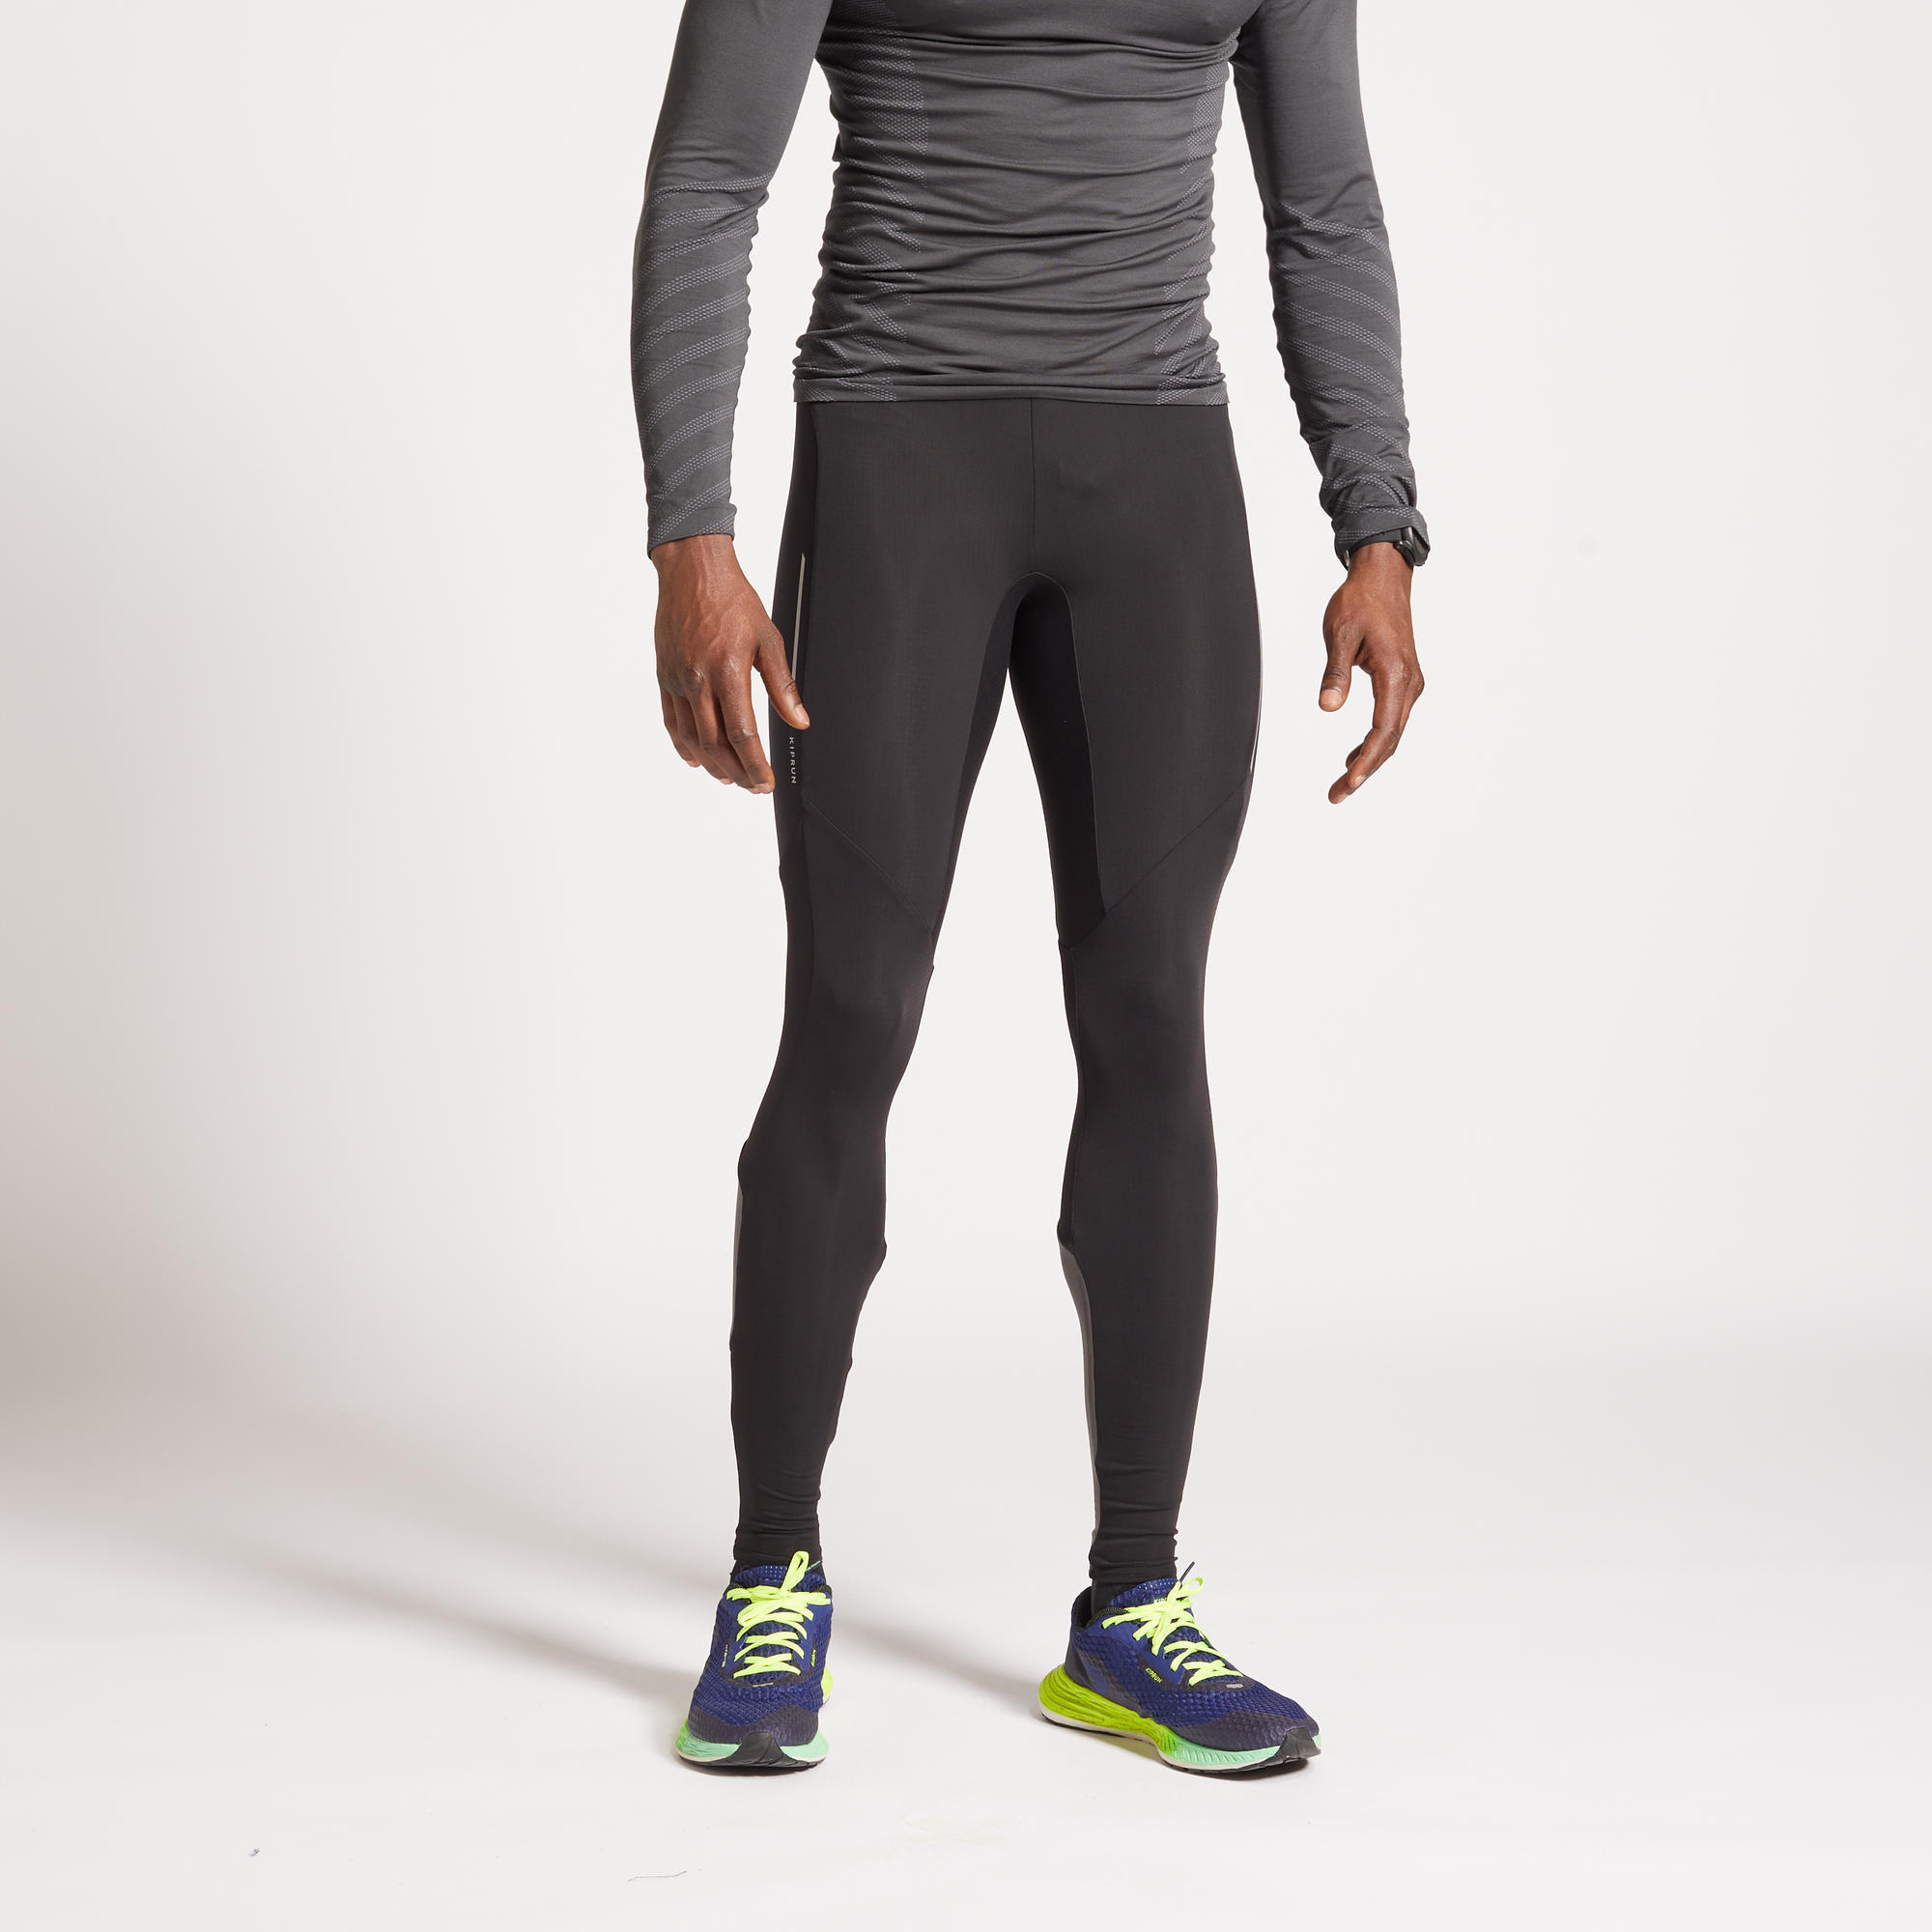 Comprar Mallas Running Para Hombre Decathlon